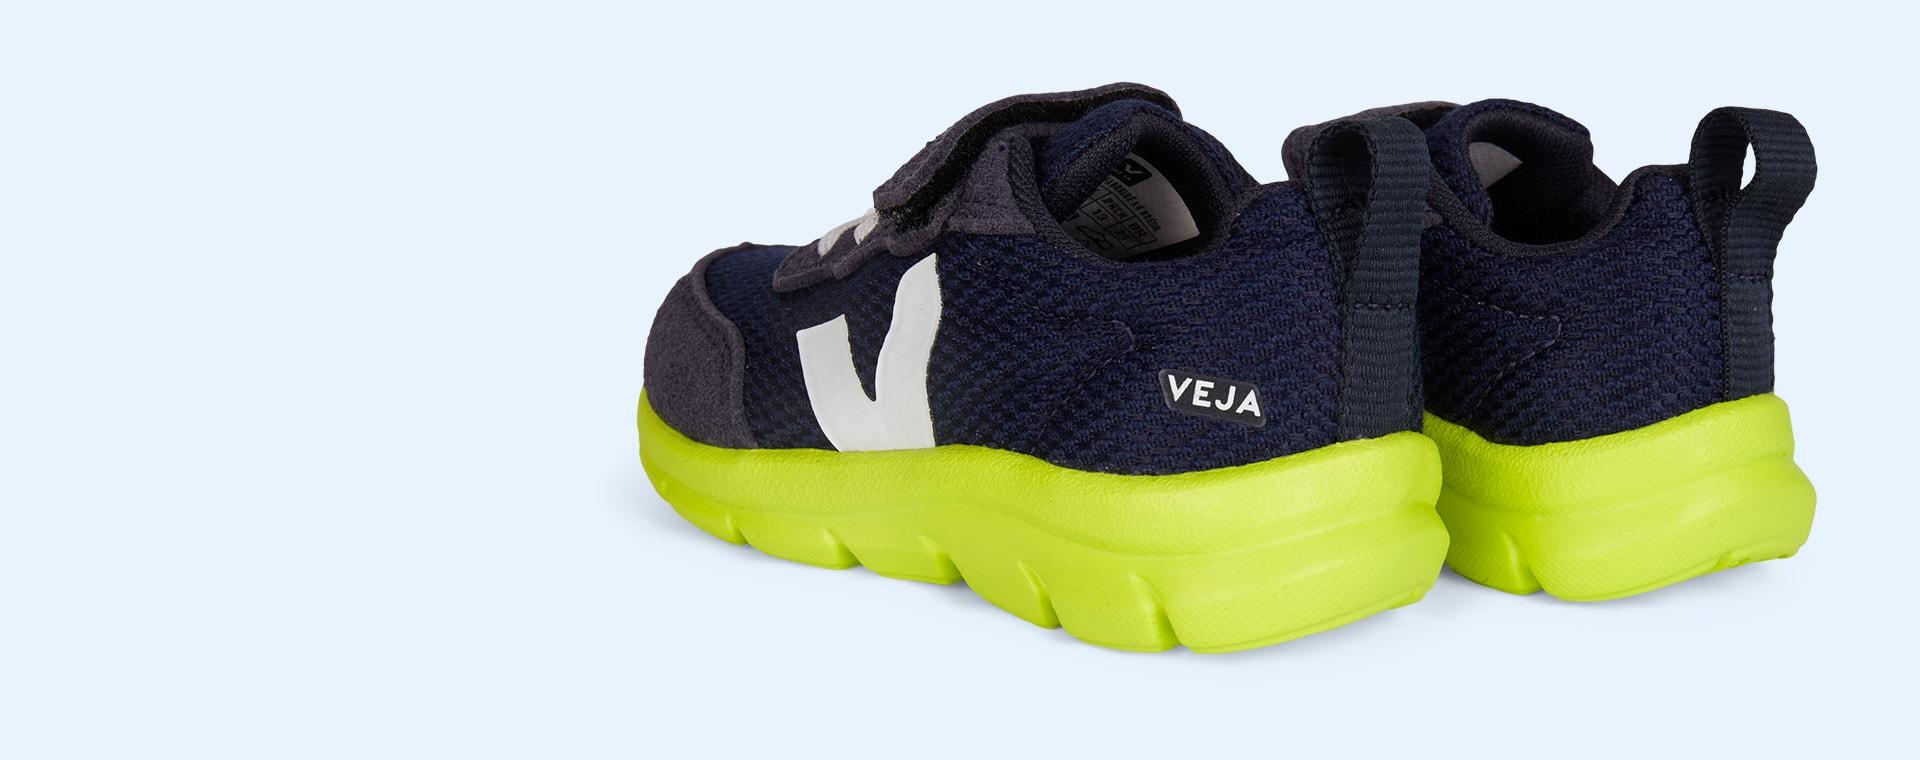 Nautico Yellow Veja Gorilla Trainer